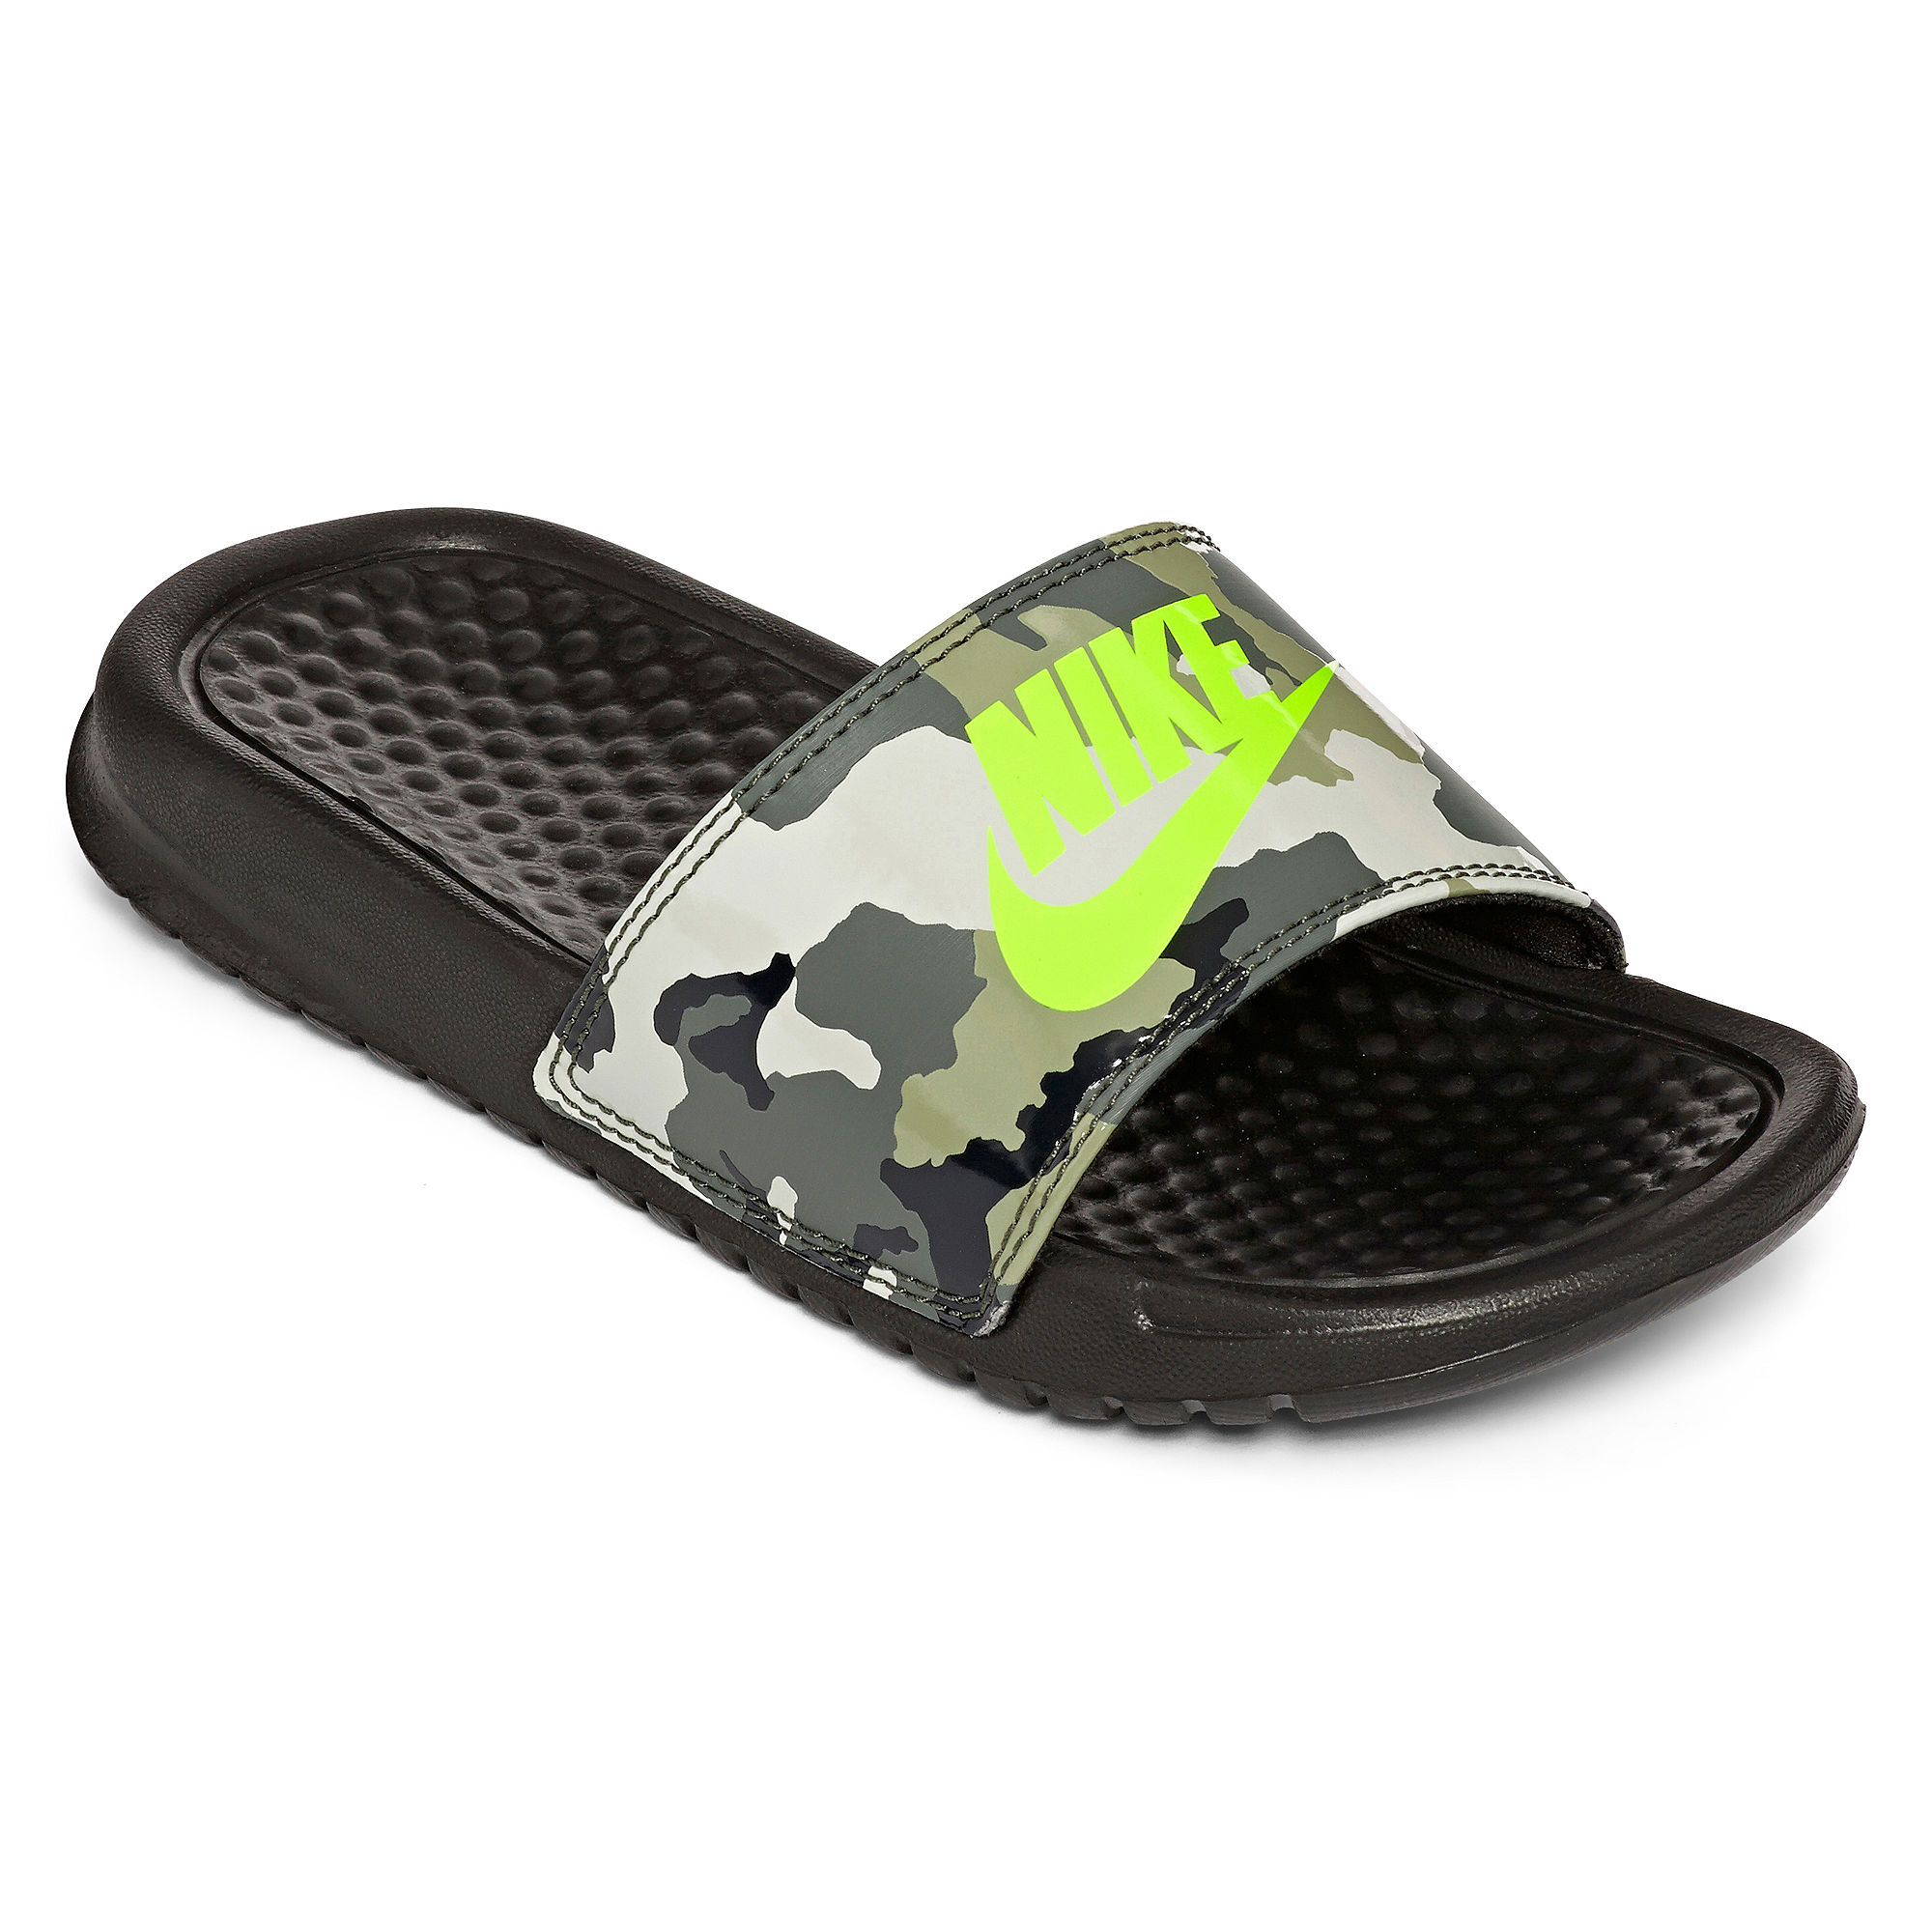 a95a71a123de cheap nike benassi camo boys slip on sandals 11fbc 32246; shopping upc  884500454781 91fd6 4d9c5